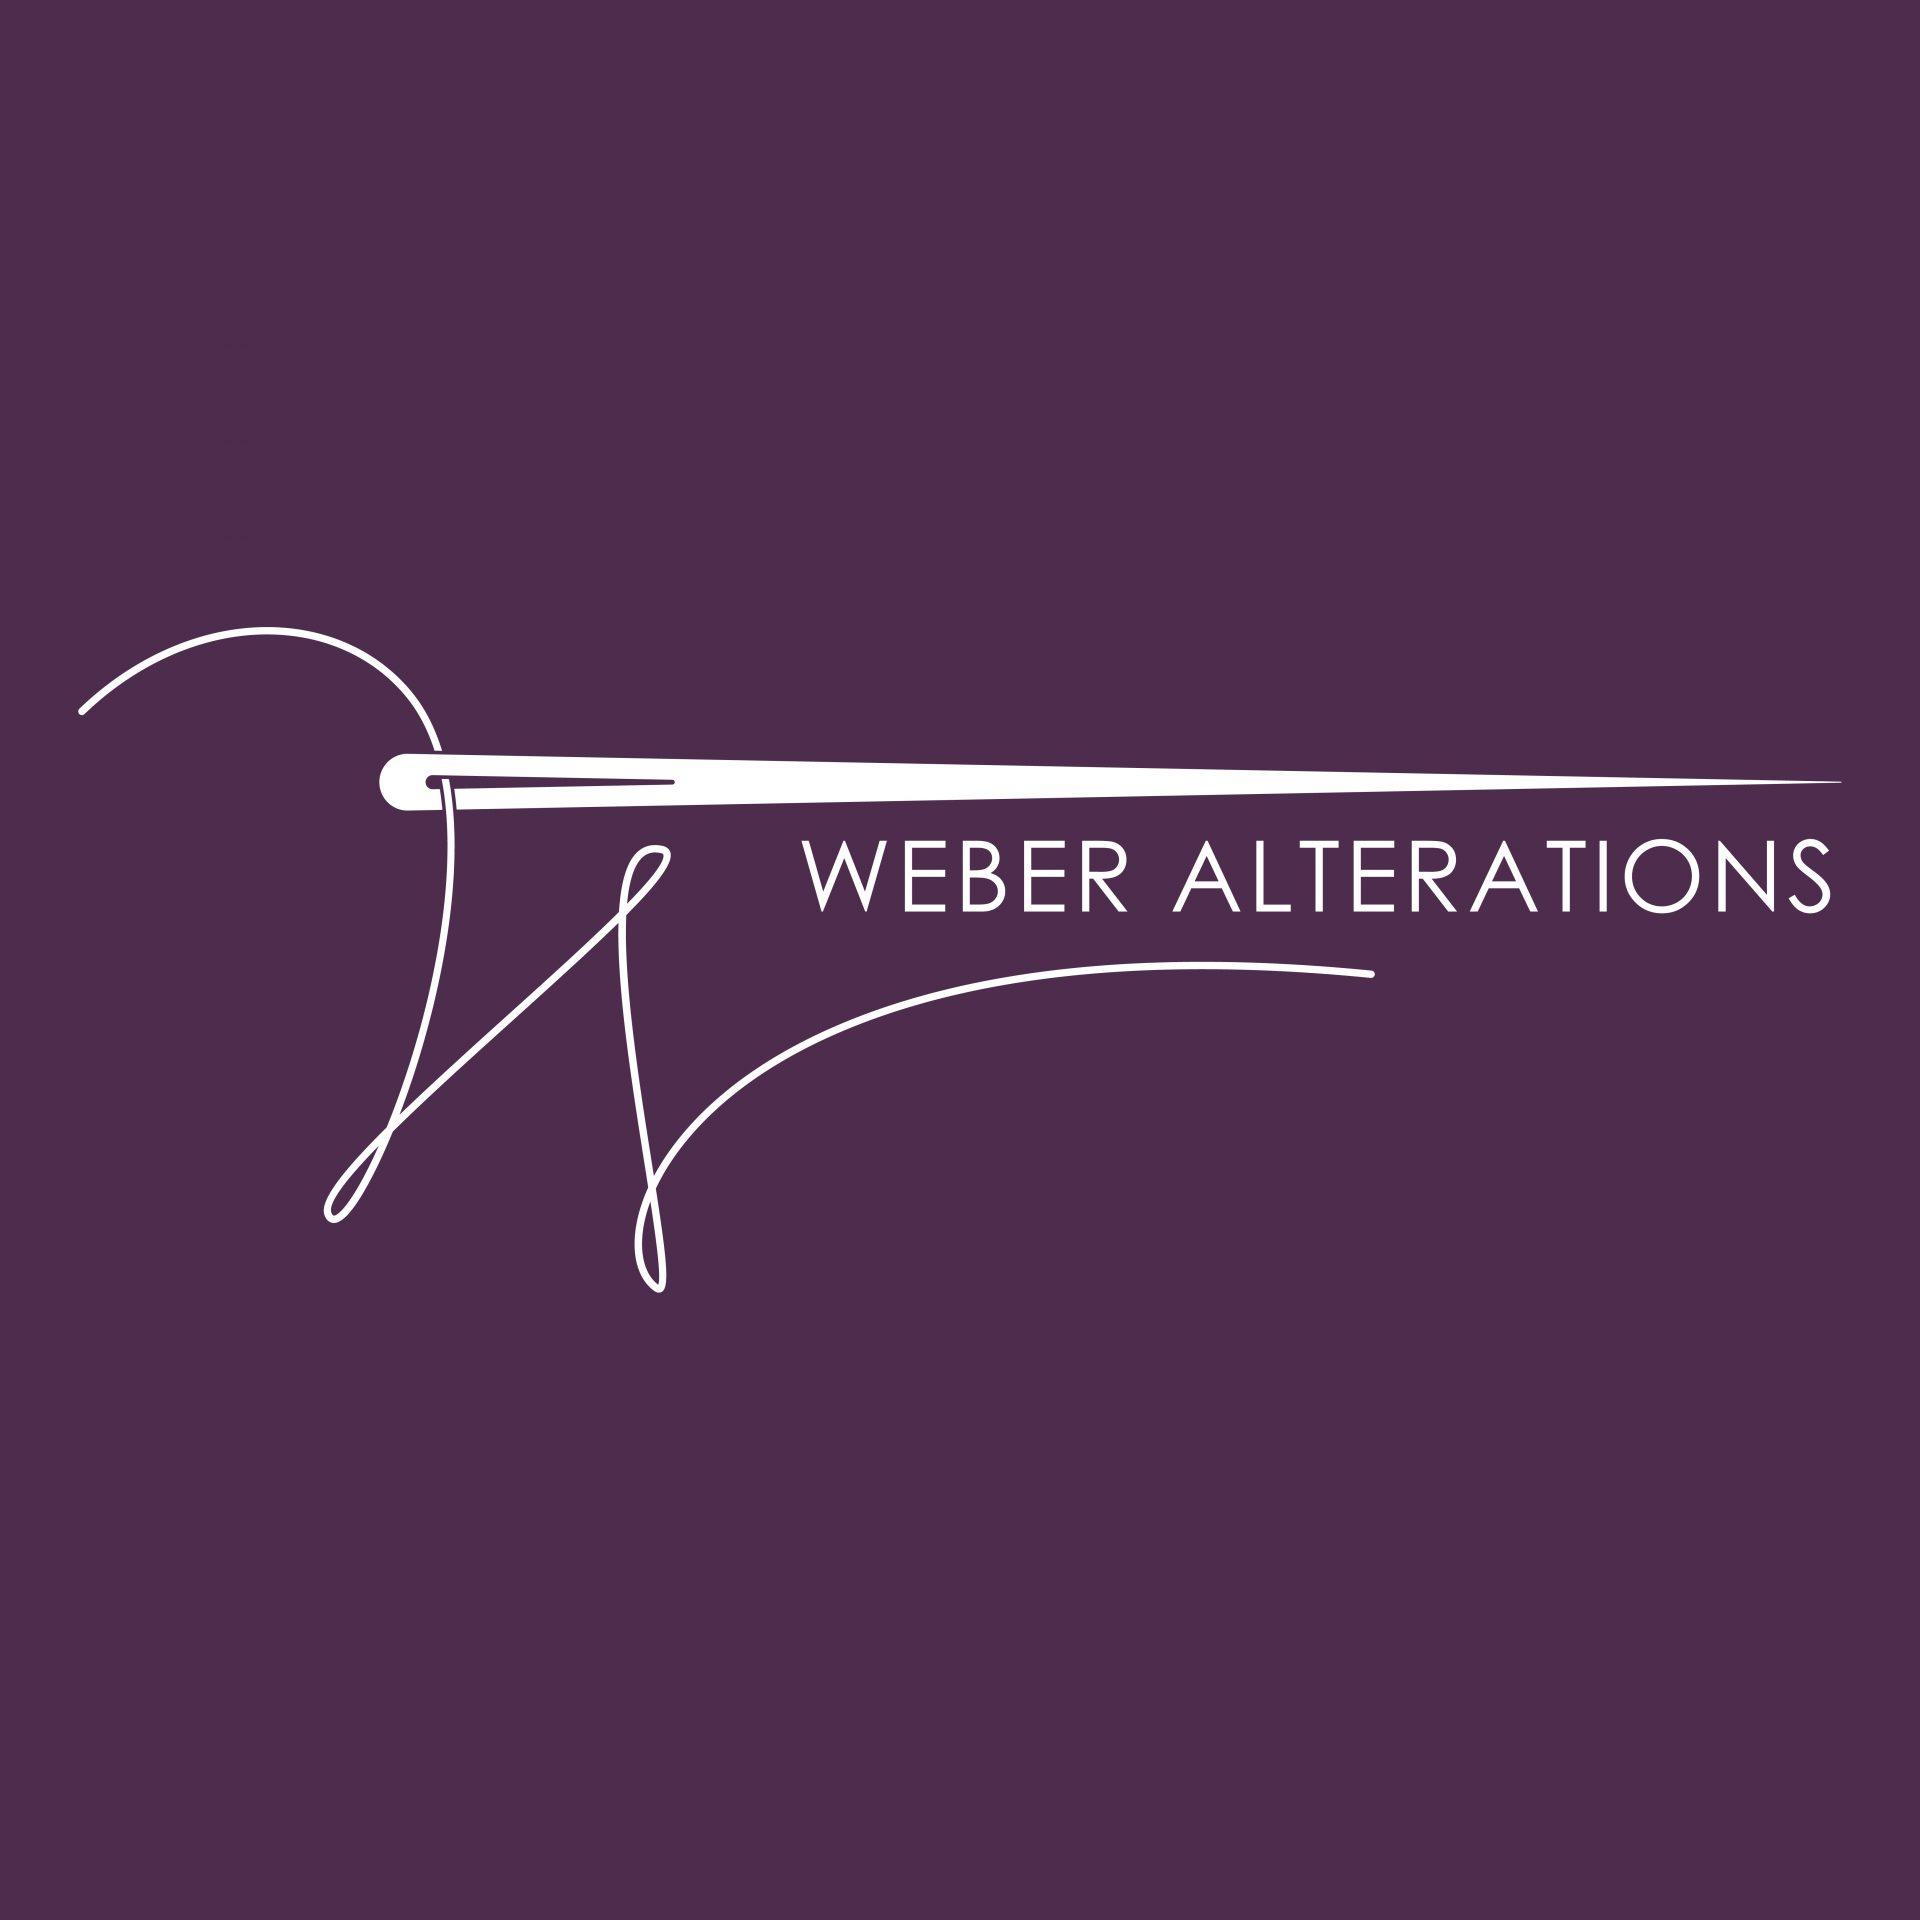 Weber Alterations